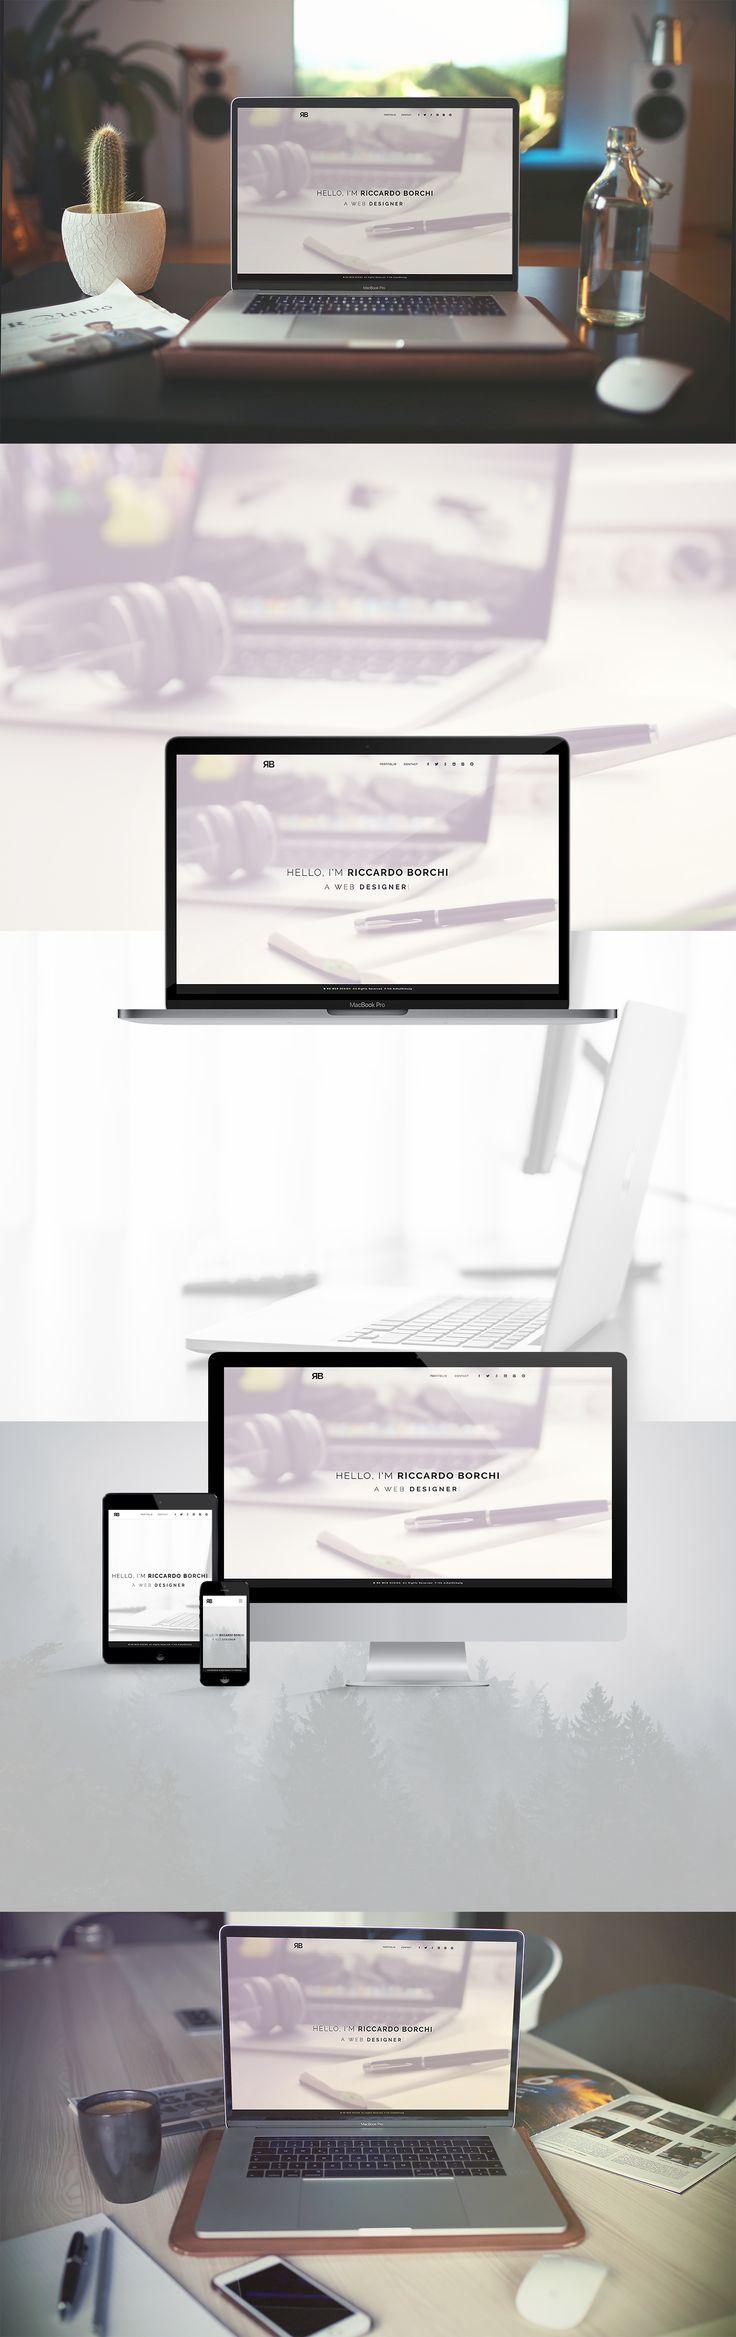 Vedi il mio progetto @Behance: \u201cRiccardo Borchi - Website\u201d https://www.behance.net/gallery/50645581/Riccardo-Borchi-Website